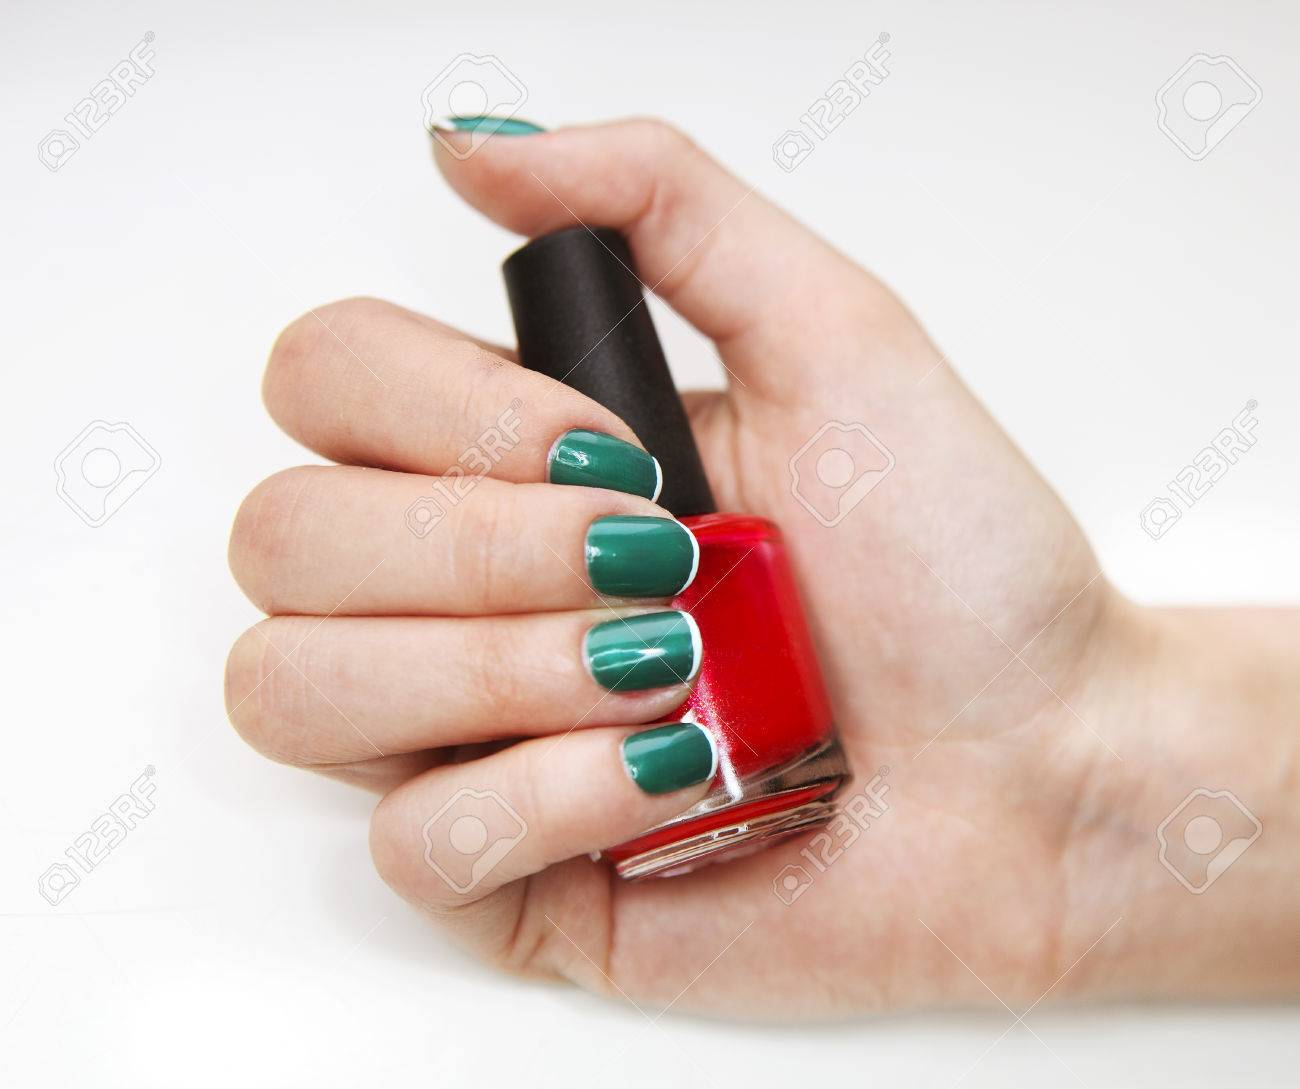 Manicure. Beauty Treatment Photo Of Nice Manicured Woman Fingernails ...